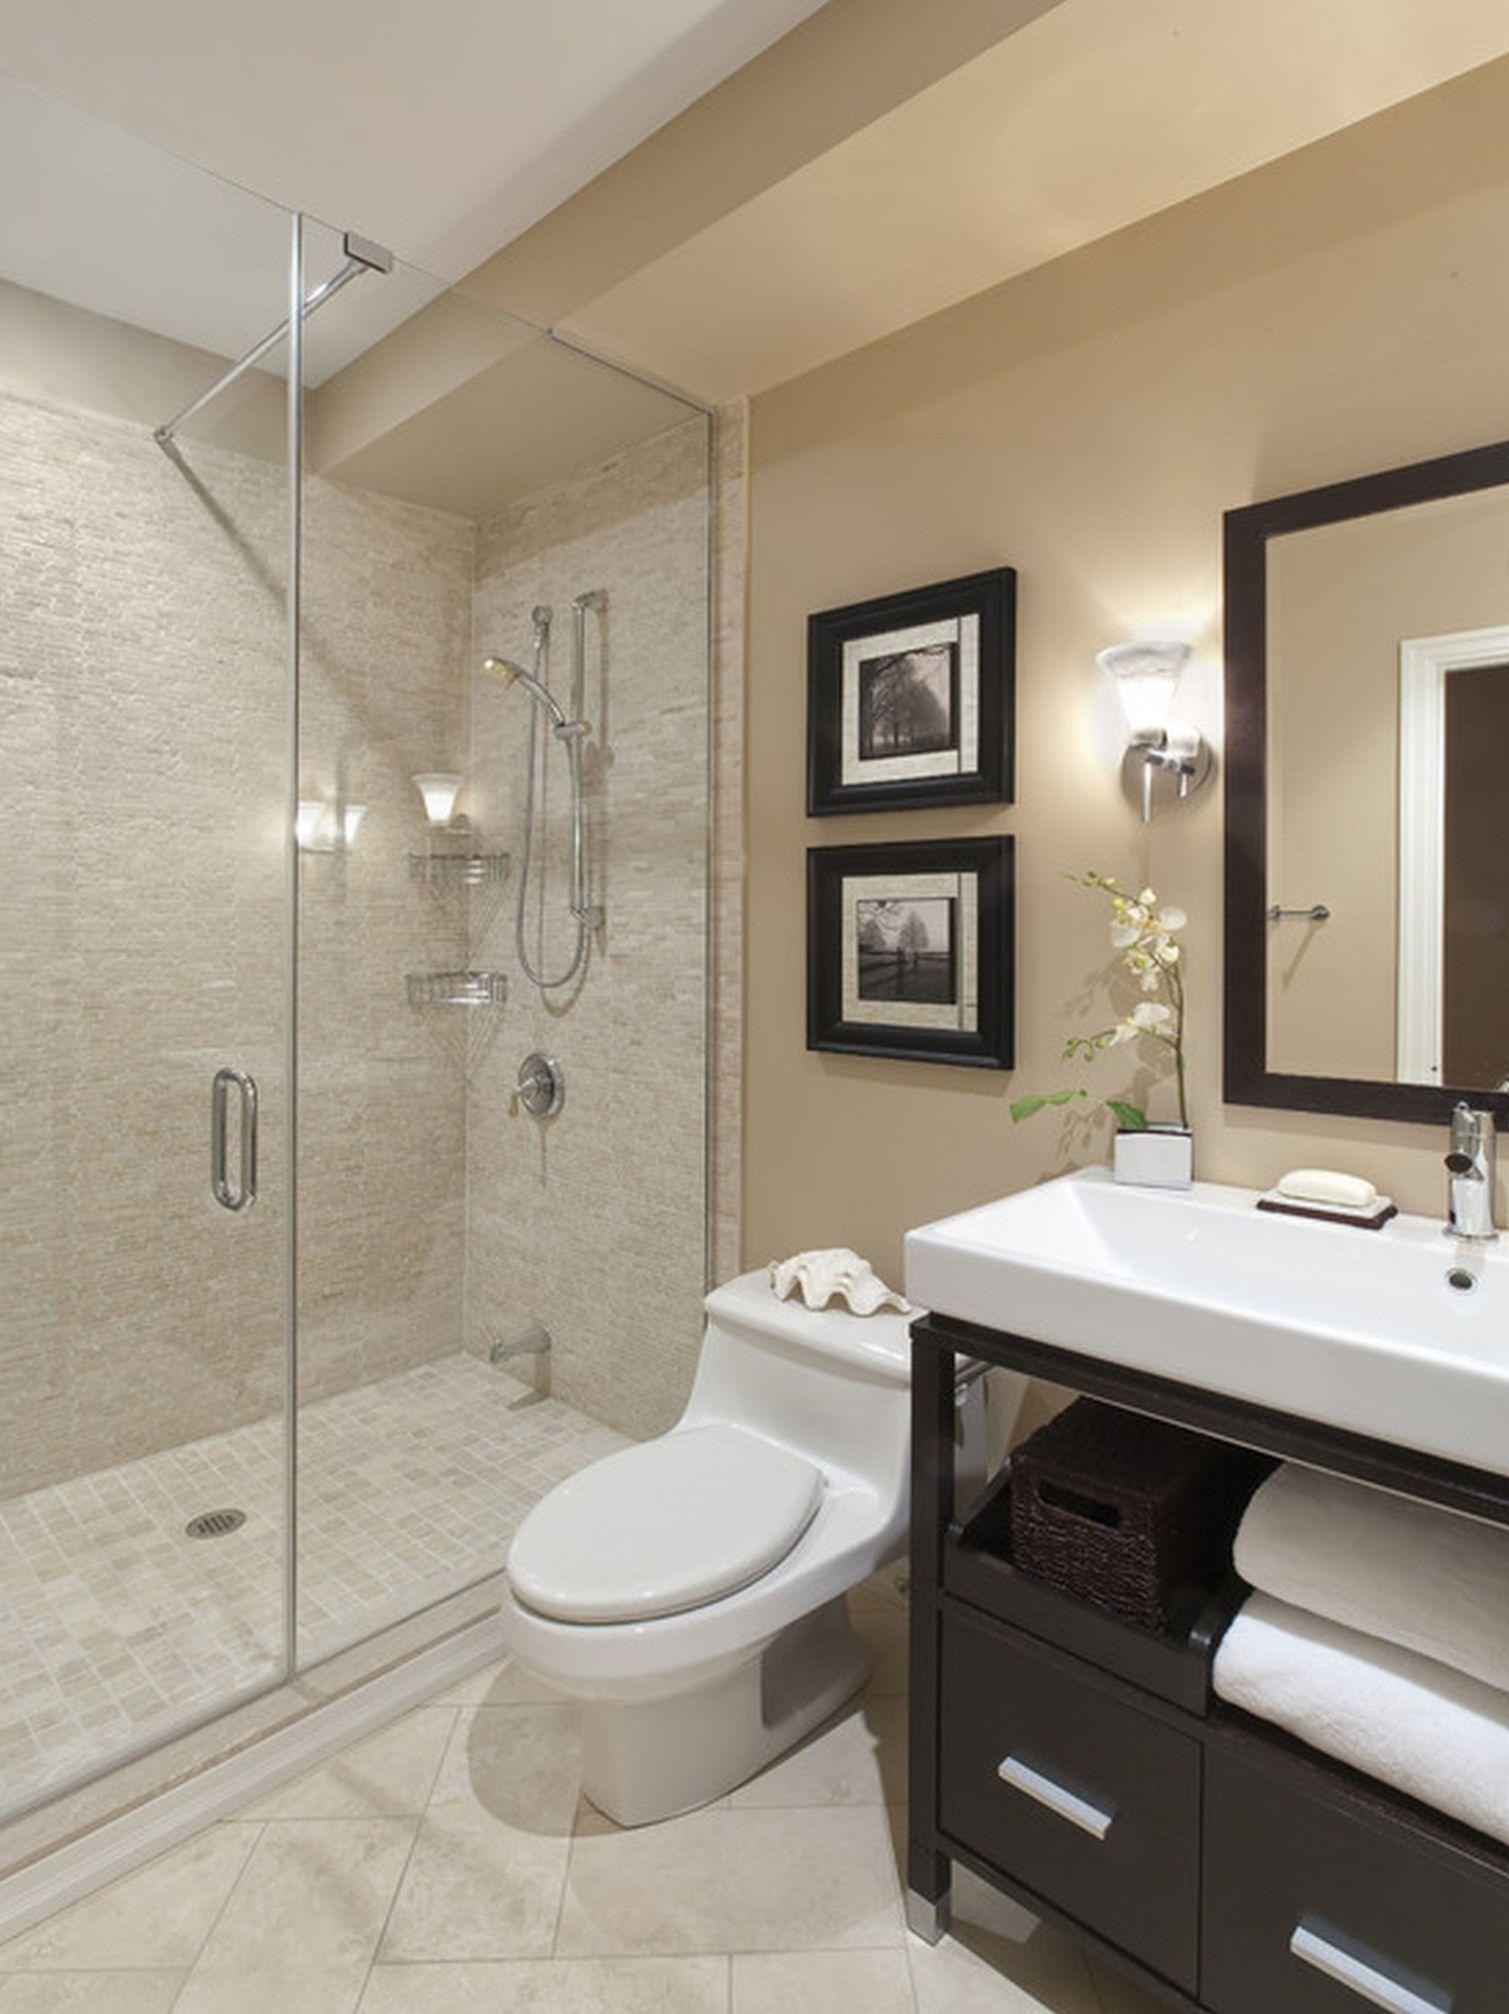 Pin By Rahayu12 On Modern Design Room Bathroom Small Bathroom